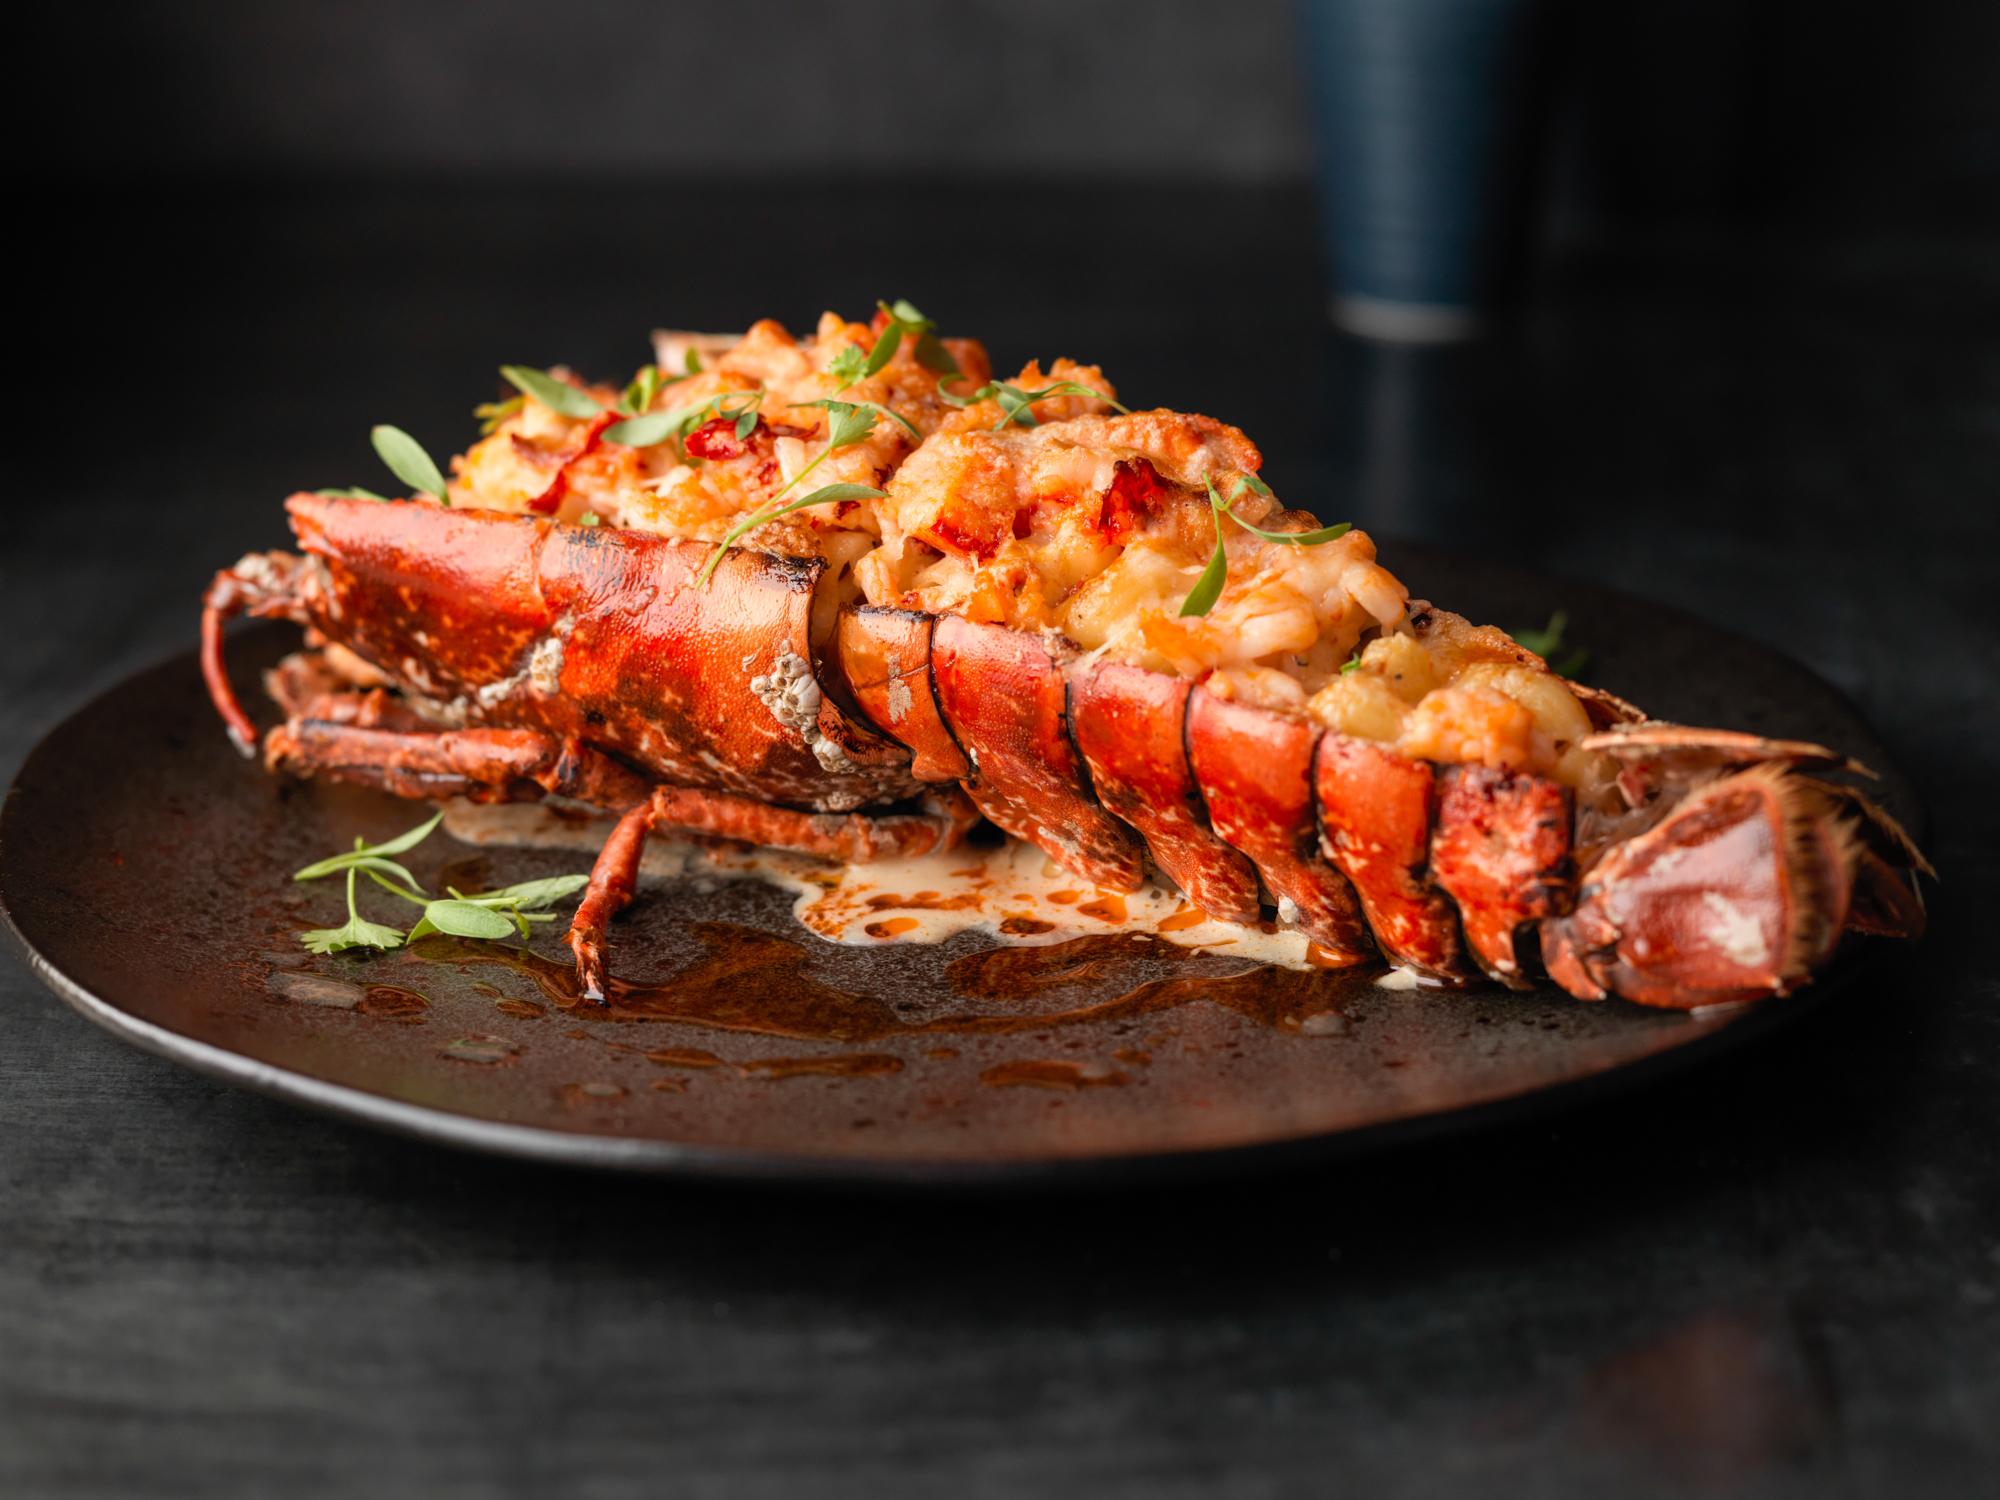 BR_Lobster MacnCheese_1076.jpg